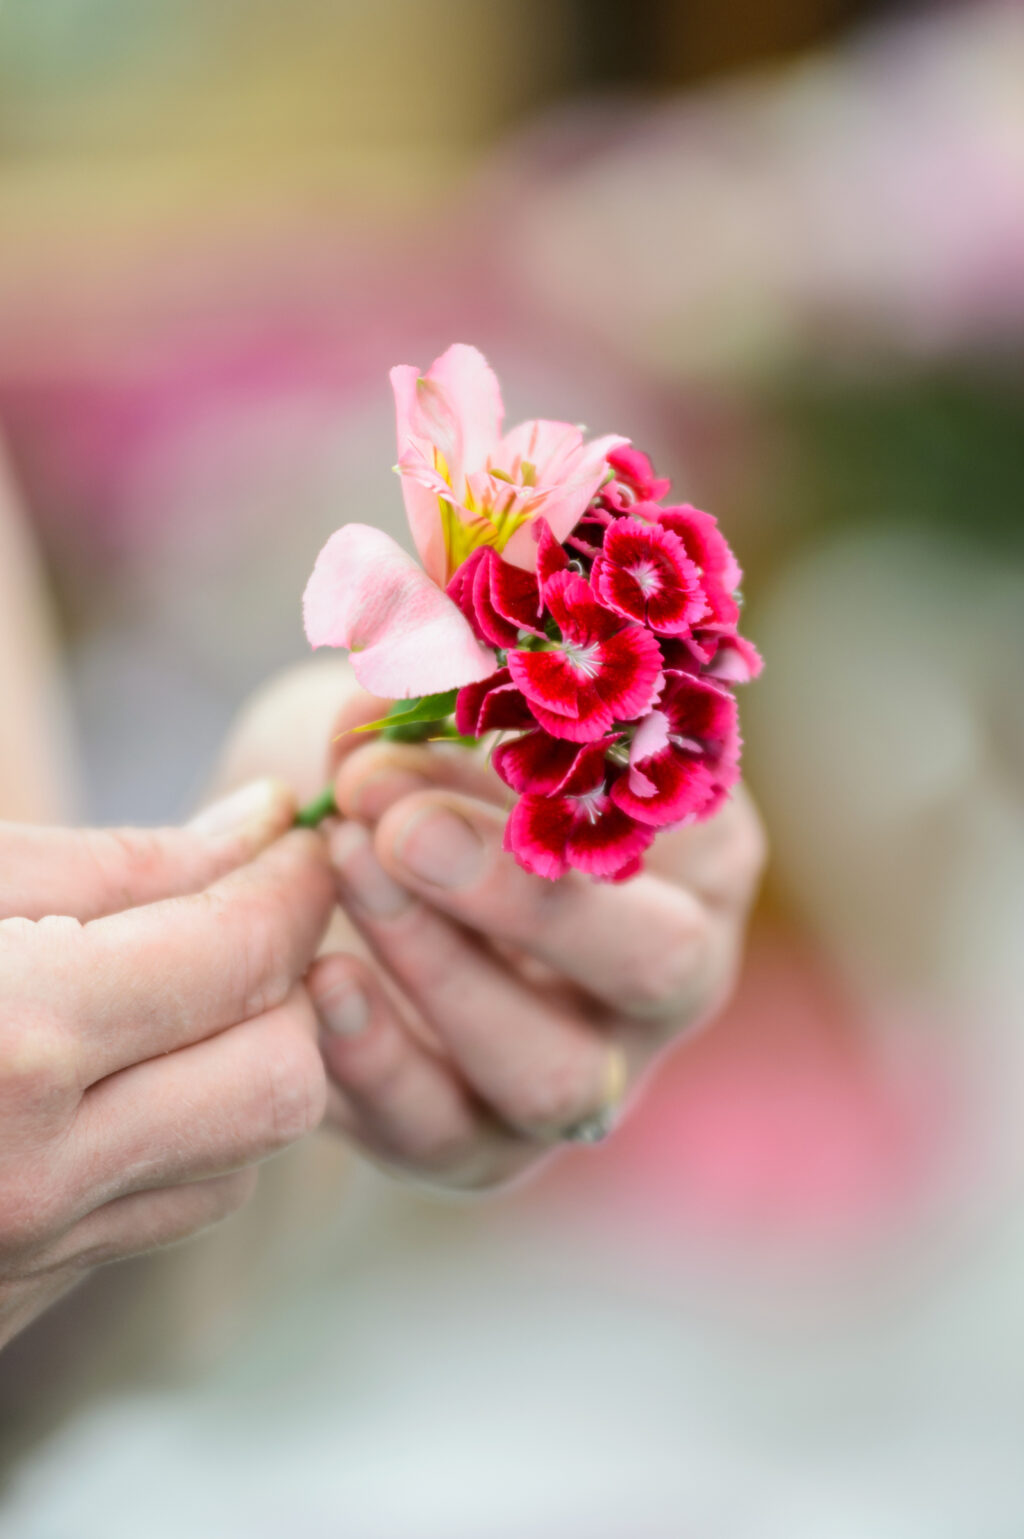 Tuckshop Flowers makes a wedding buttonhole with colourful sweet williams at BBC Gardeners' World Live. Photo: Jason Ingram